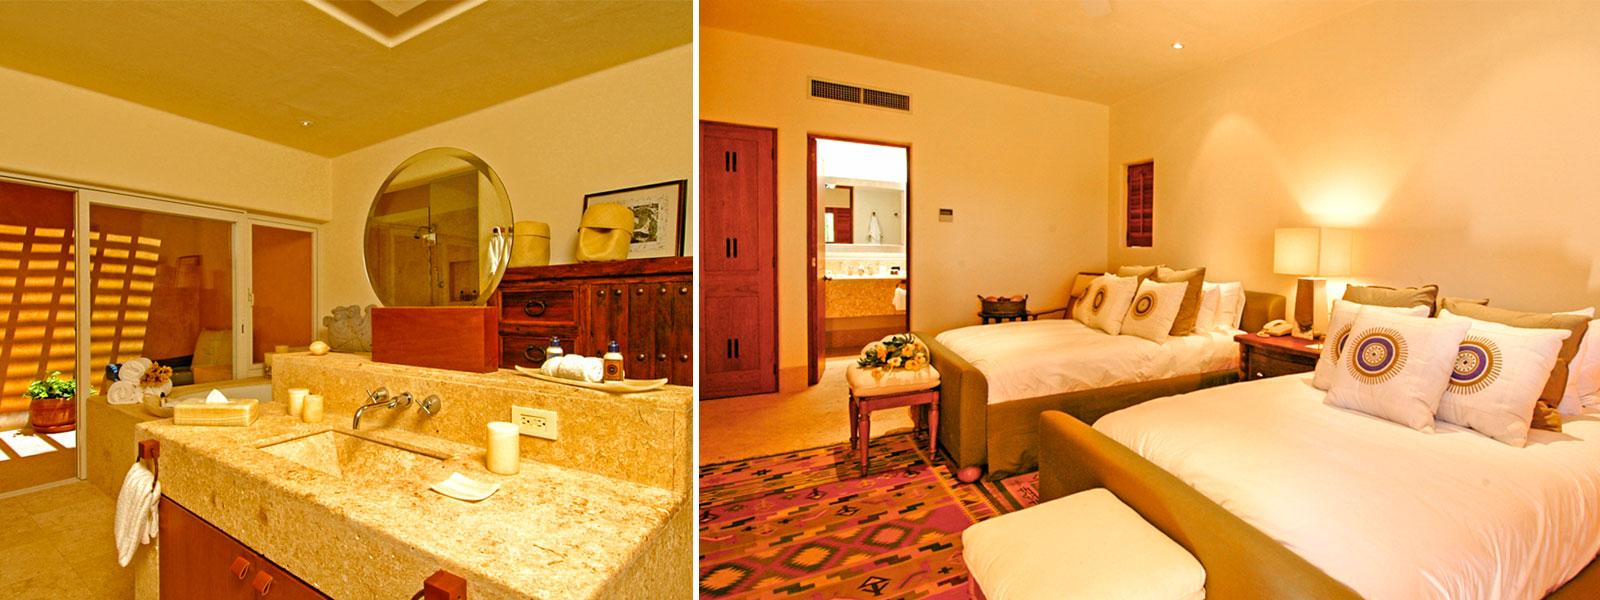 Four Seasons Private Villa 24 - Four Seasons Resort - Punta Mita, Riviera Nayarit, Mexico